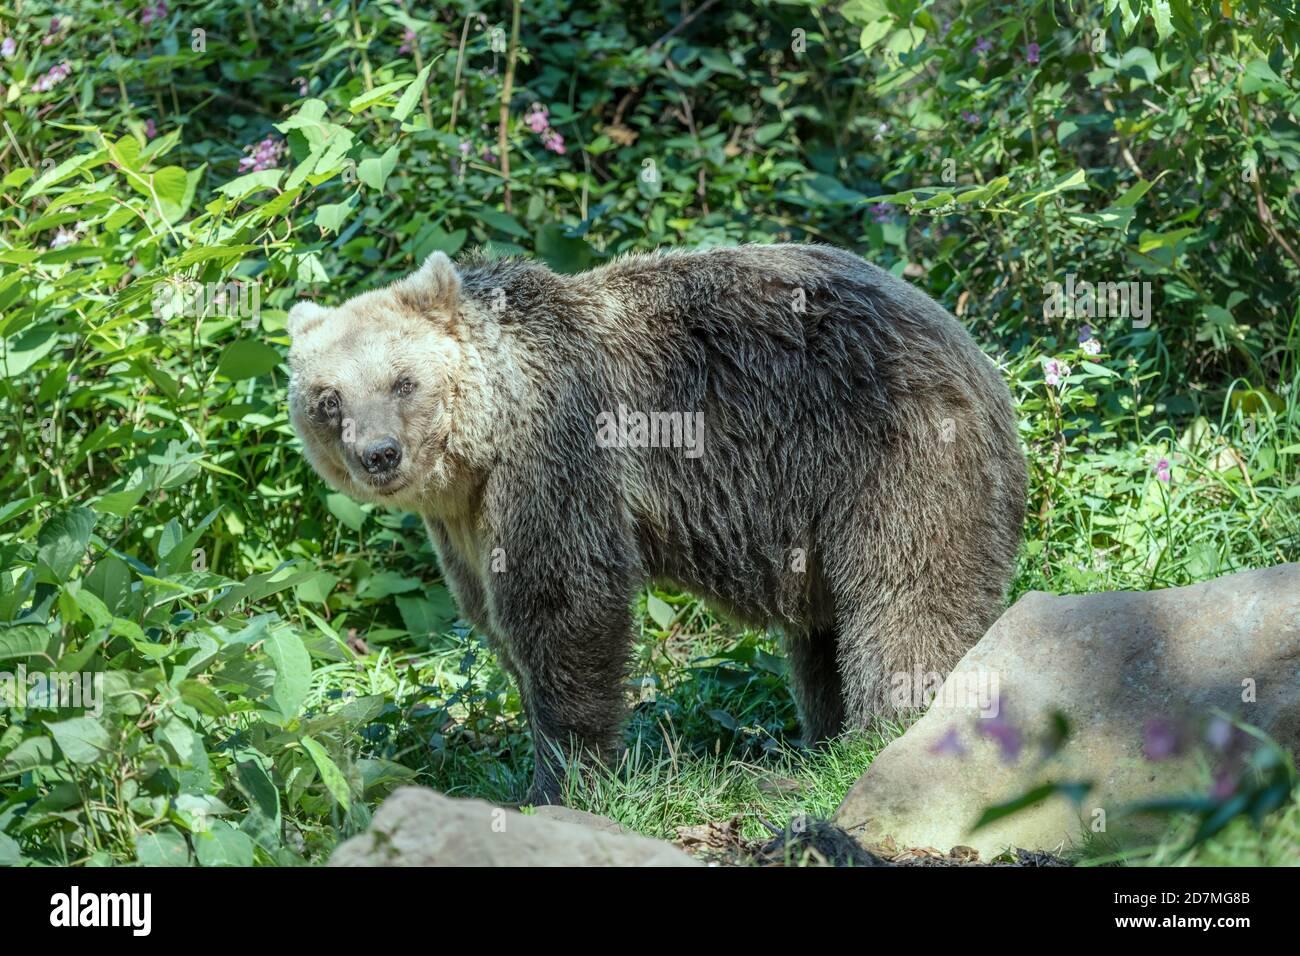 brown bear standing among vegetation, shot in park near Schapbach, Black Forest, Baden Wuttenberg, Germany Stock Photo